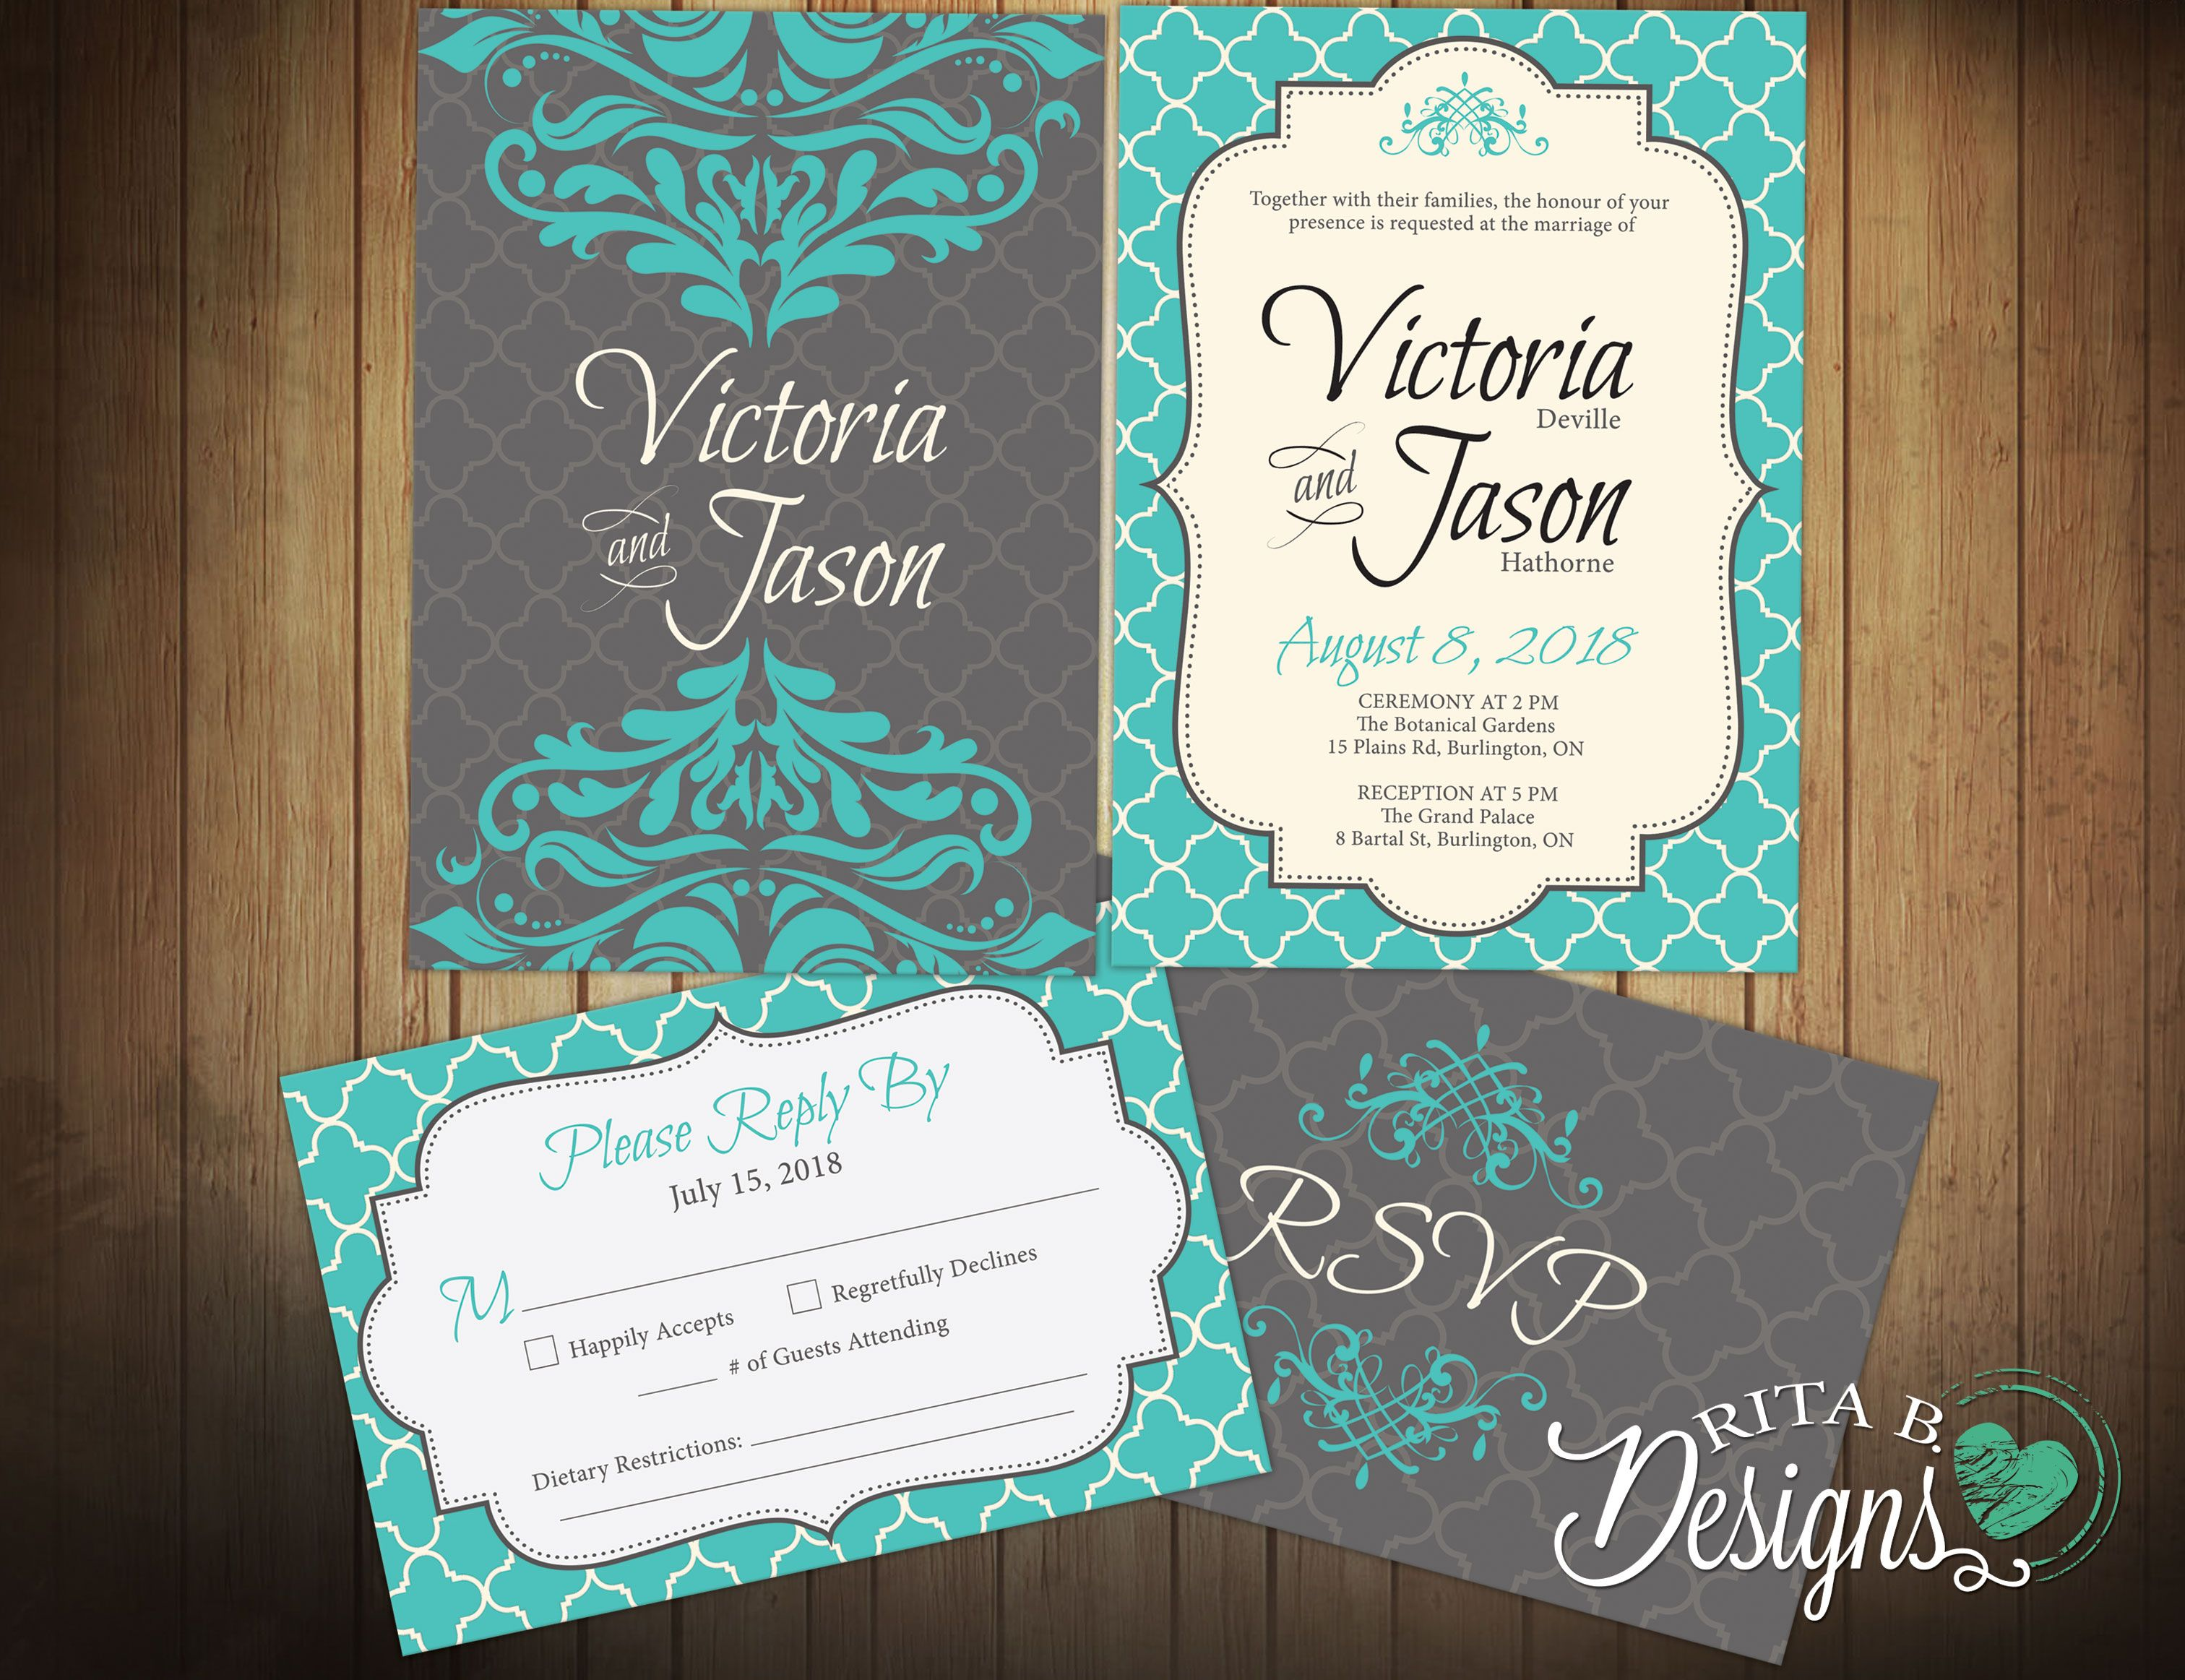 wedding invitation card format marathi wording%0A Wedding Invitation Response Card   Wedding Invitation Response Card Wording   Superb Invitation  Superb Invitation